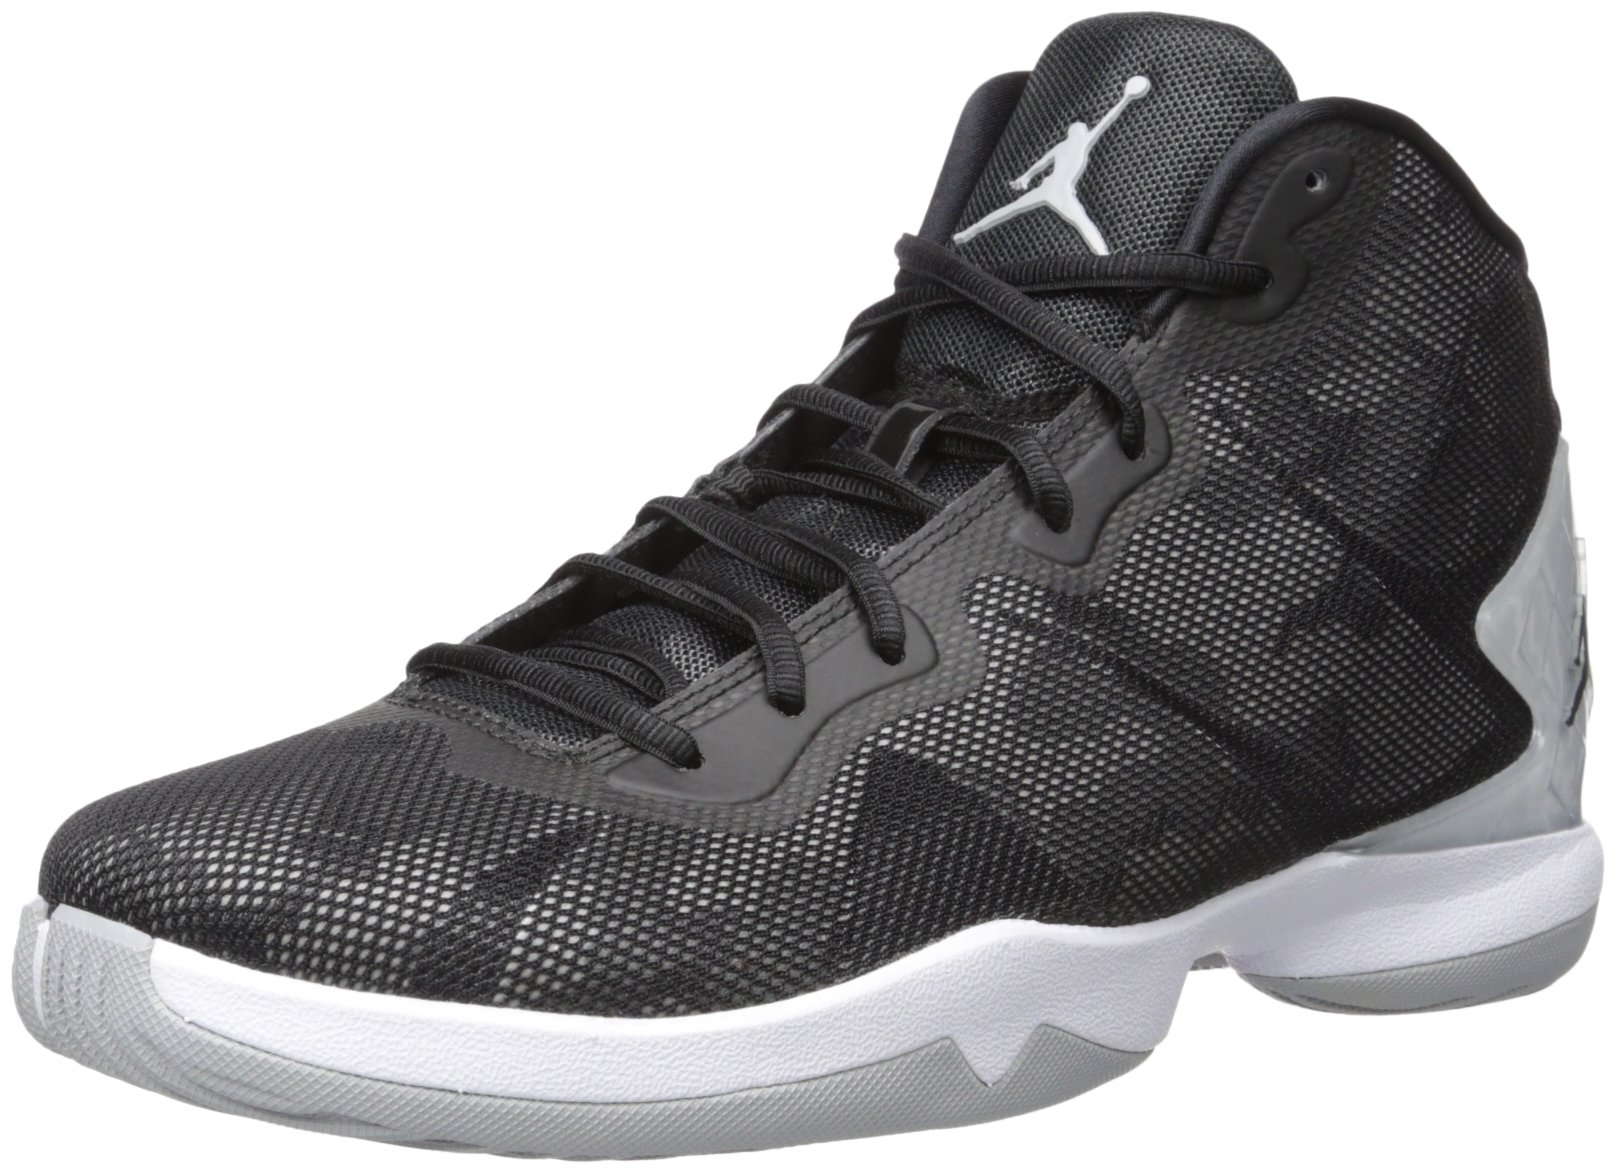 Nike Jordan Men's Jordan Super.Fly 4 Black/Black/Wlf Grey/Infrrd 23 Basketball Shoe 10.5 Men US by Jordan